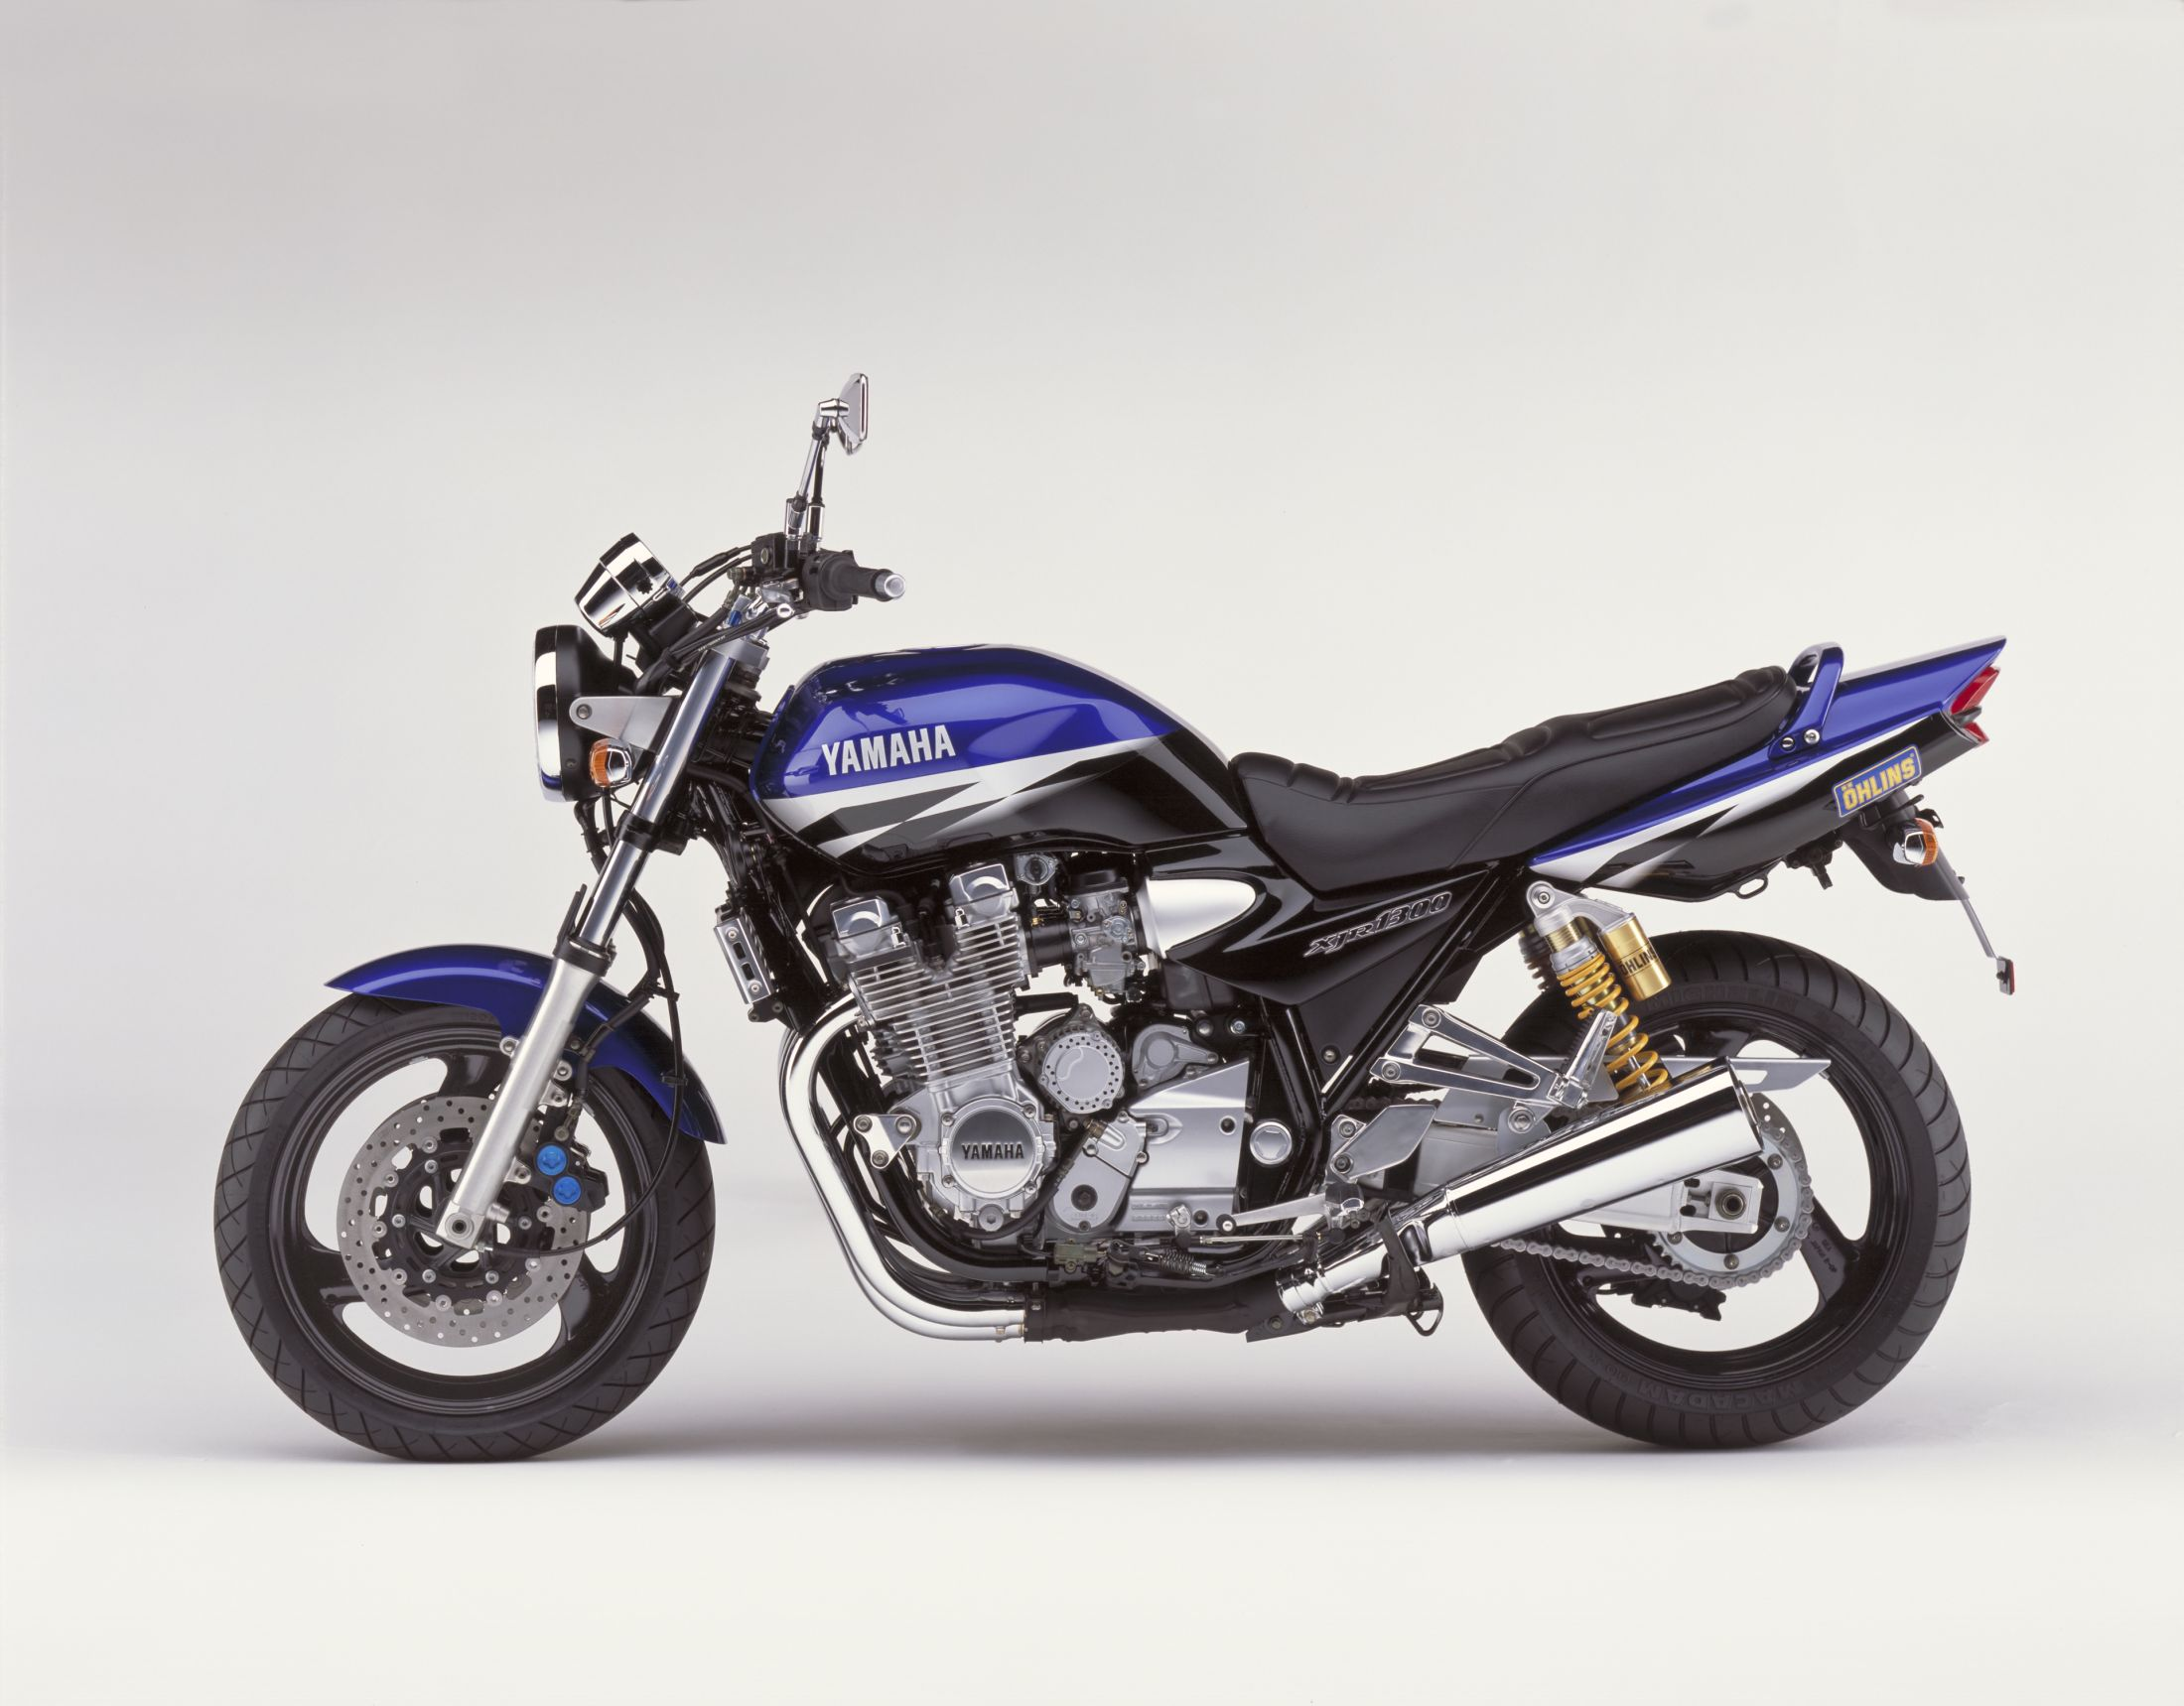 Мотоцикл yamaha xjr 1300 50th anniversary 2005